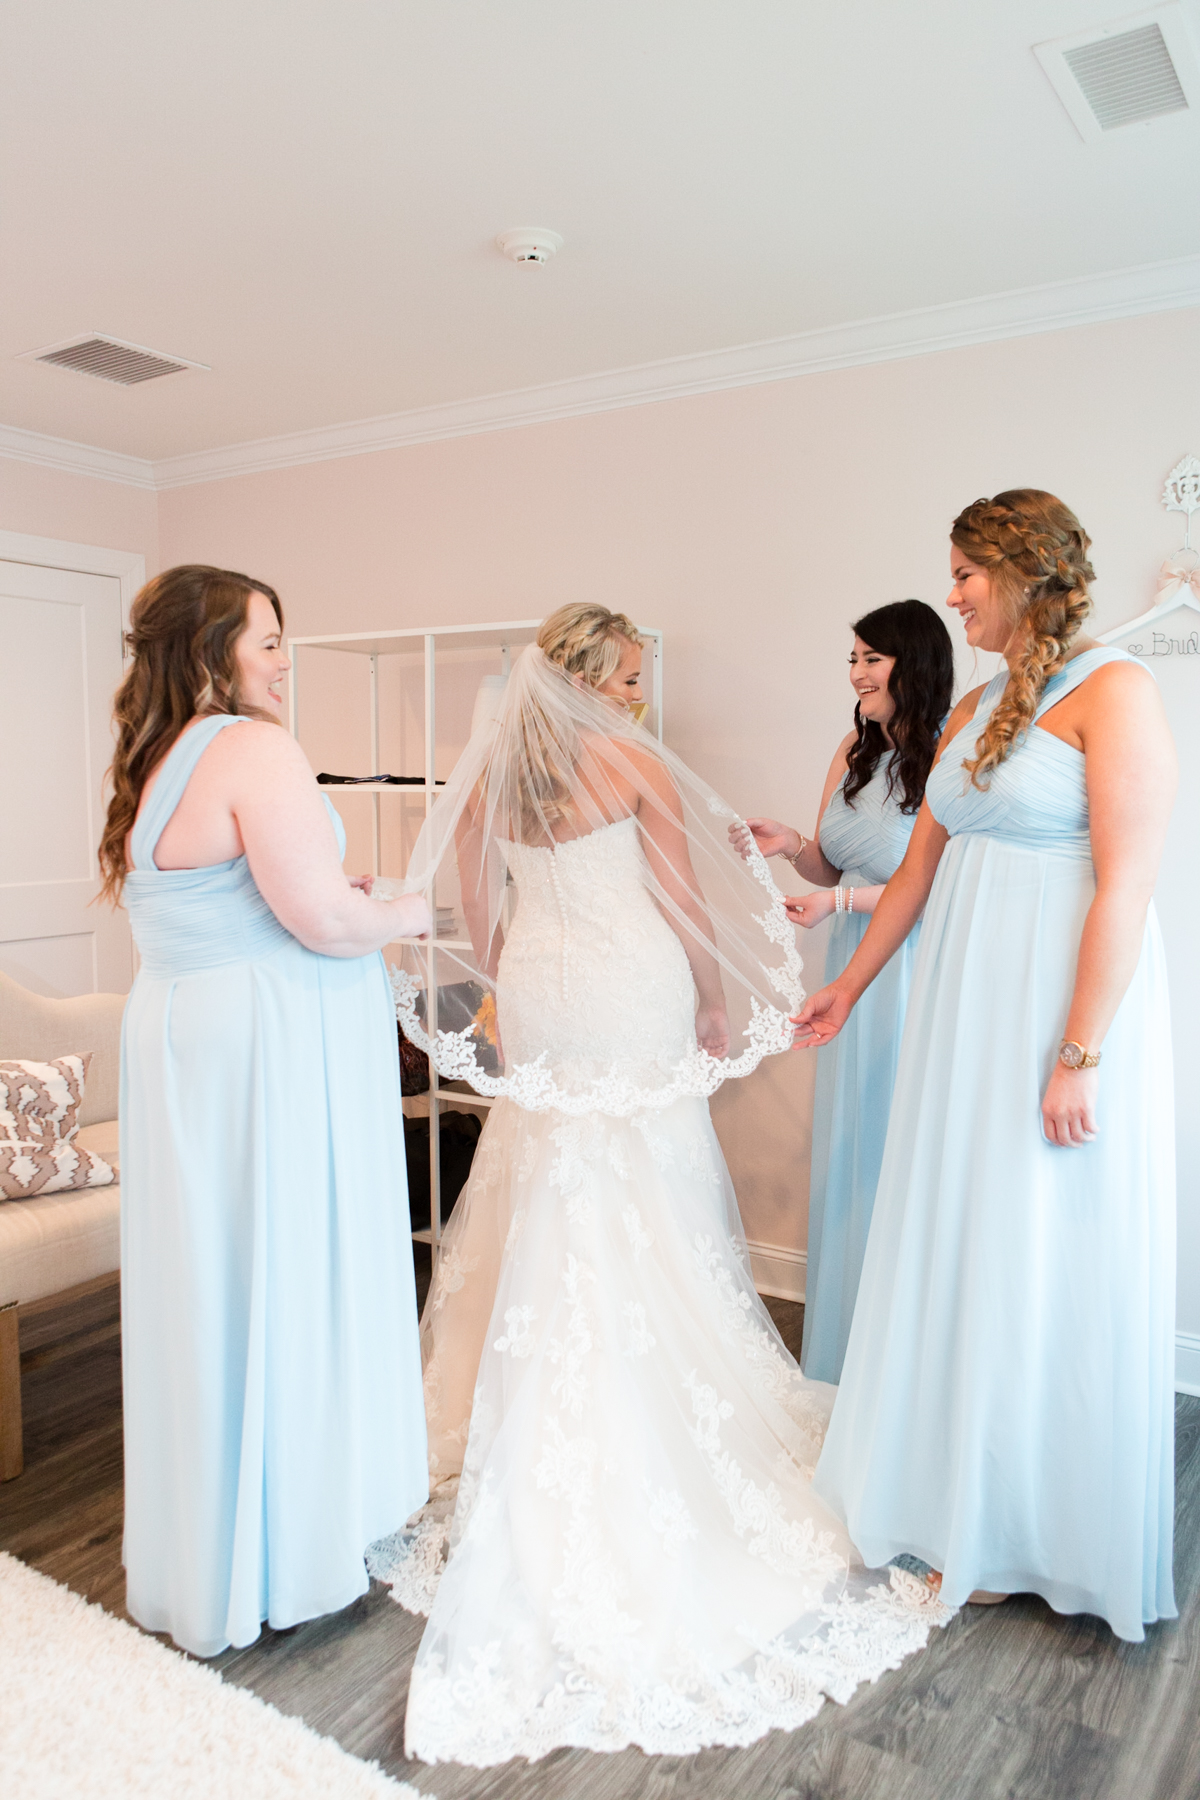 wedding-dress-and-veil.jpg